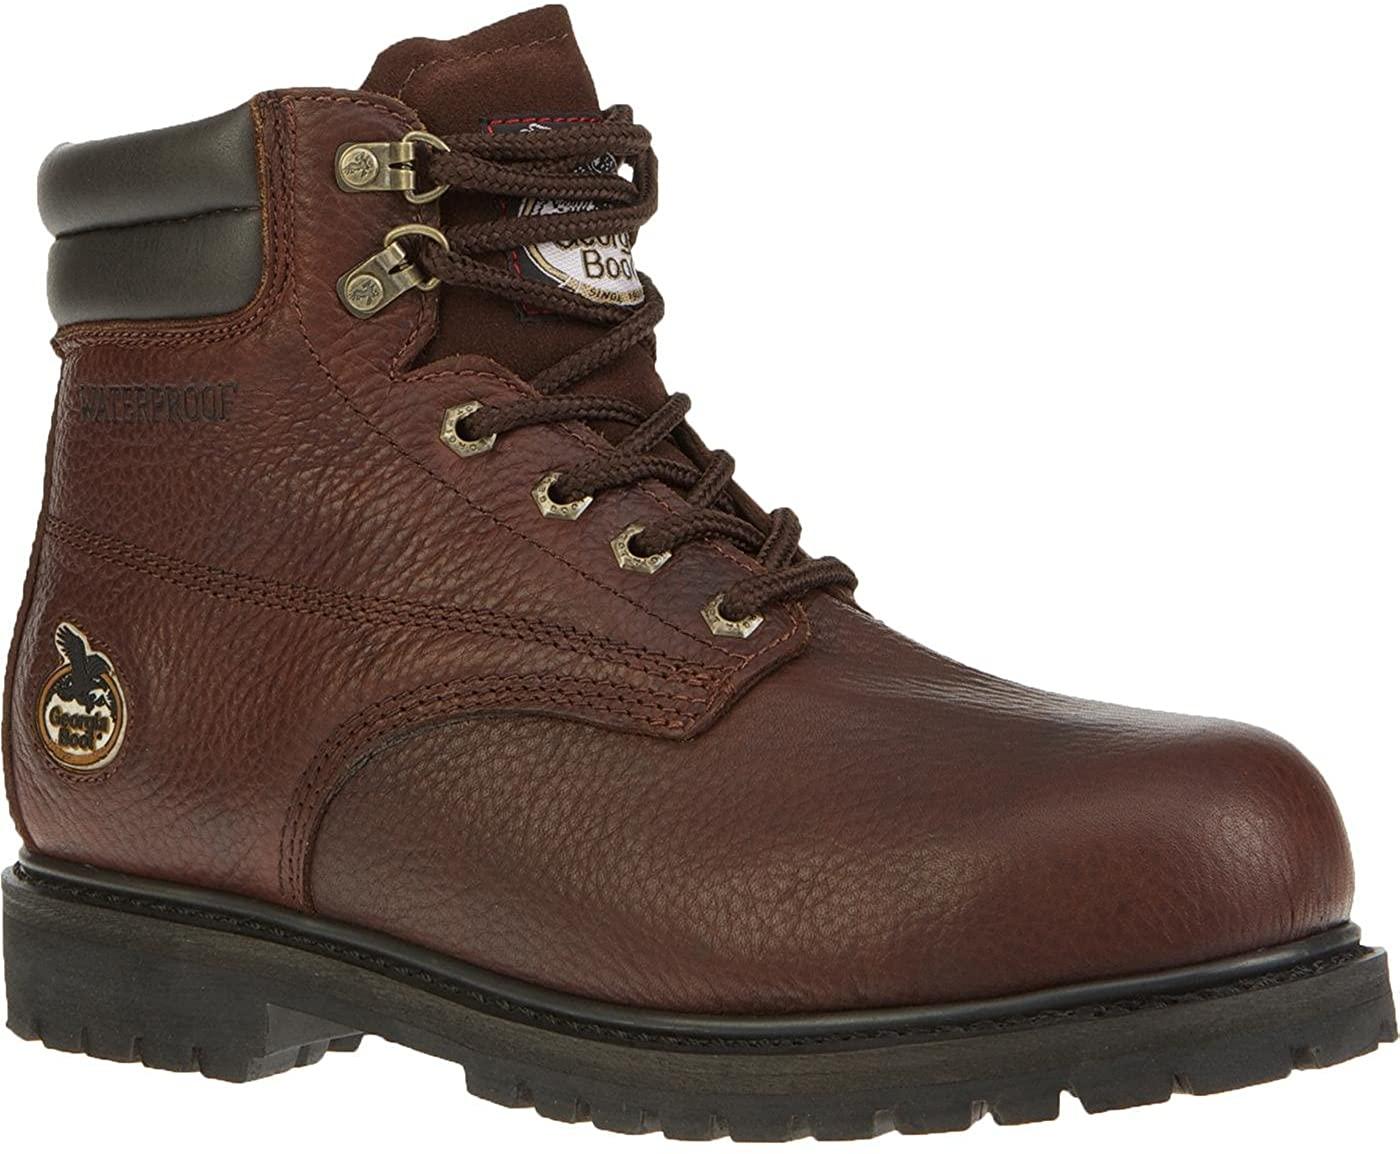 Georgia Men's 6 Inches Oiler Steel Toe Waterproof Work Shoe-G6174